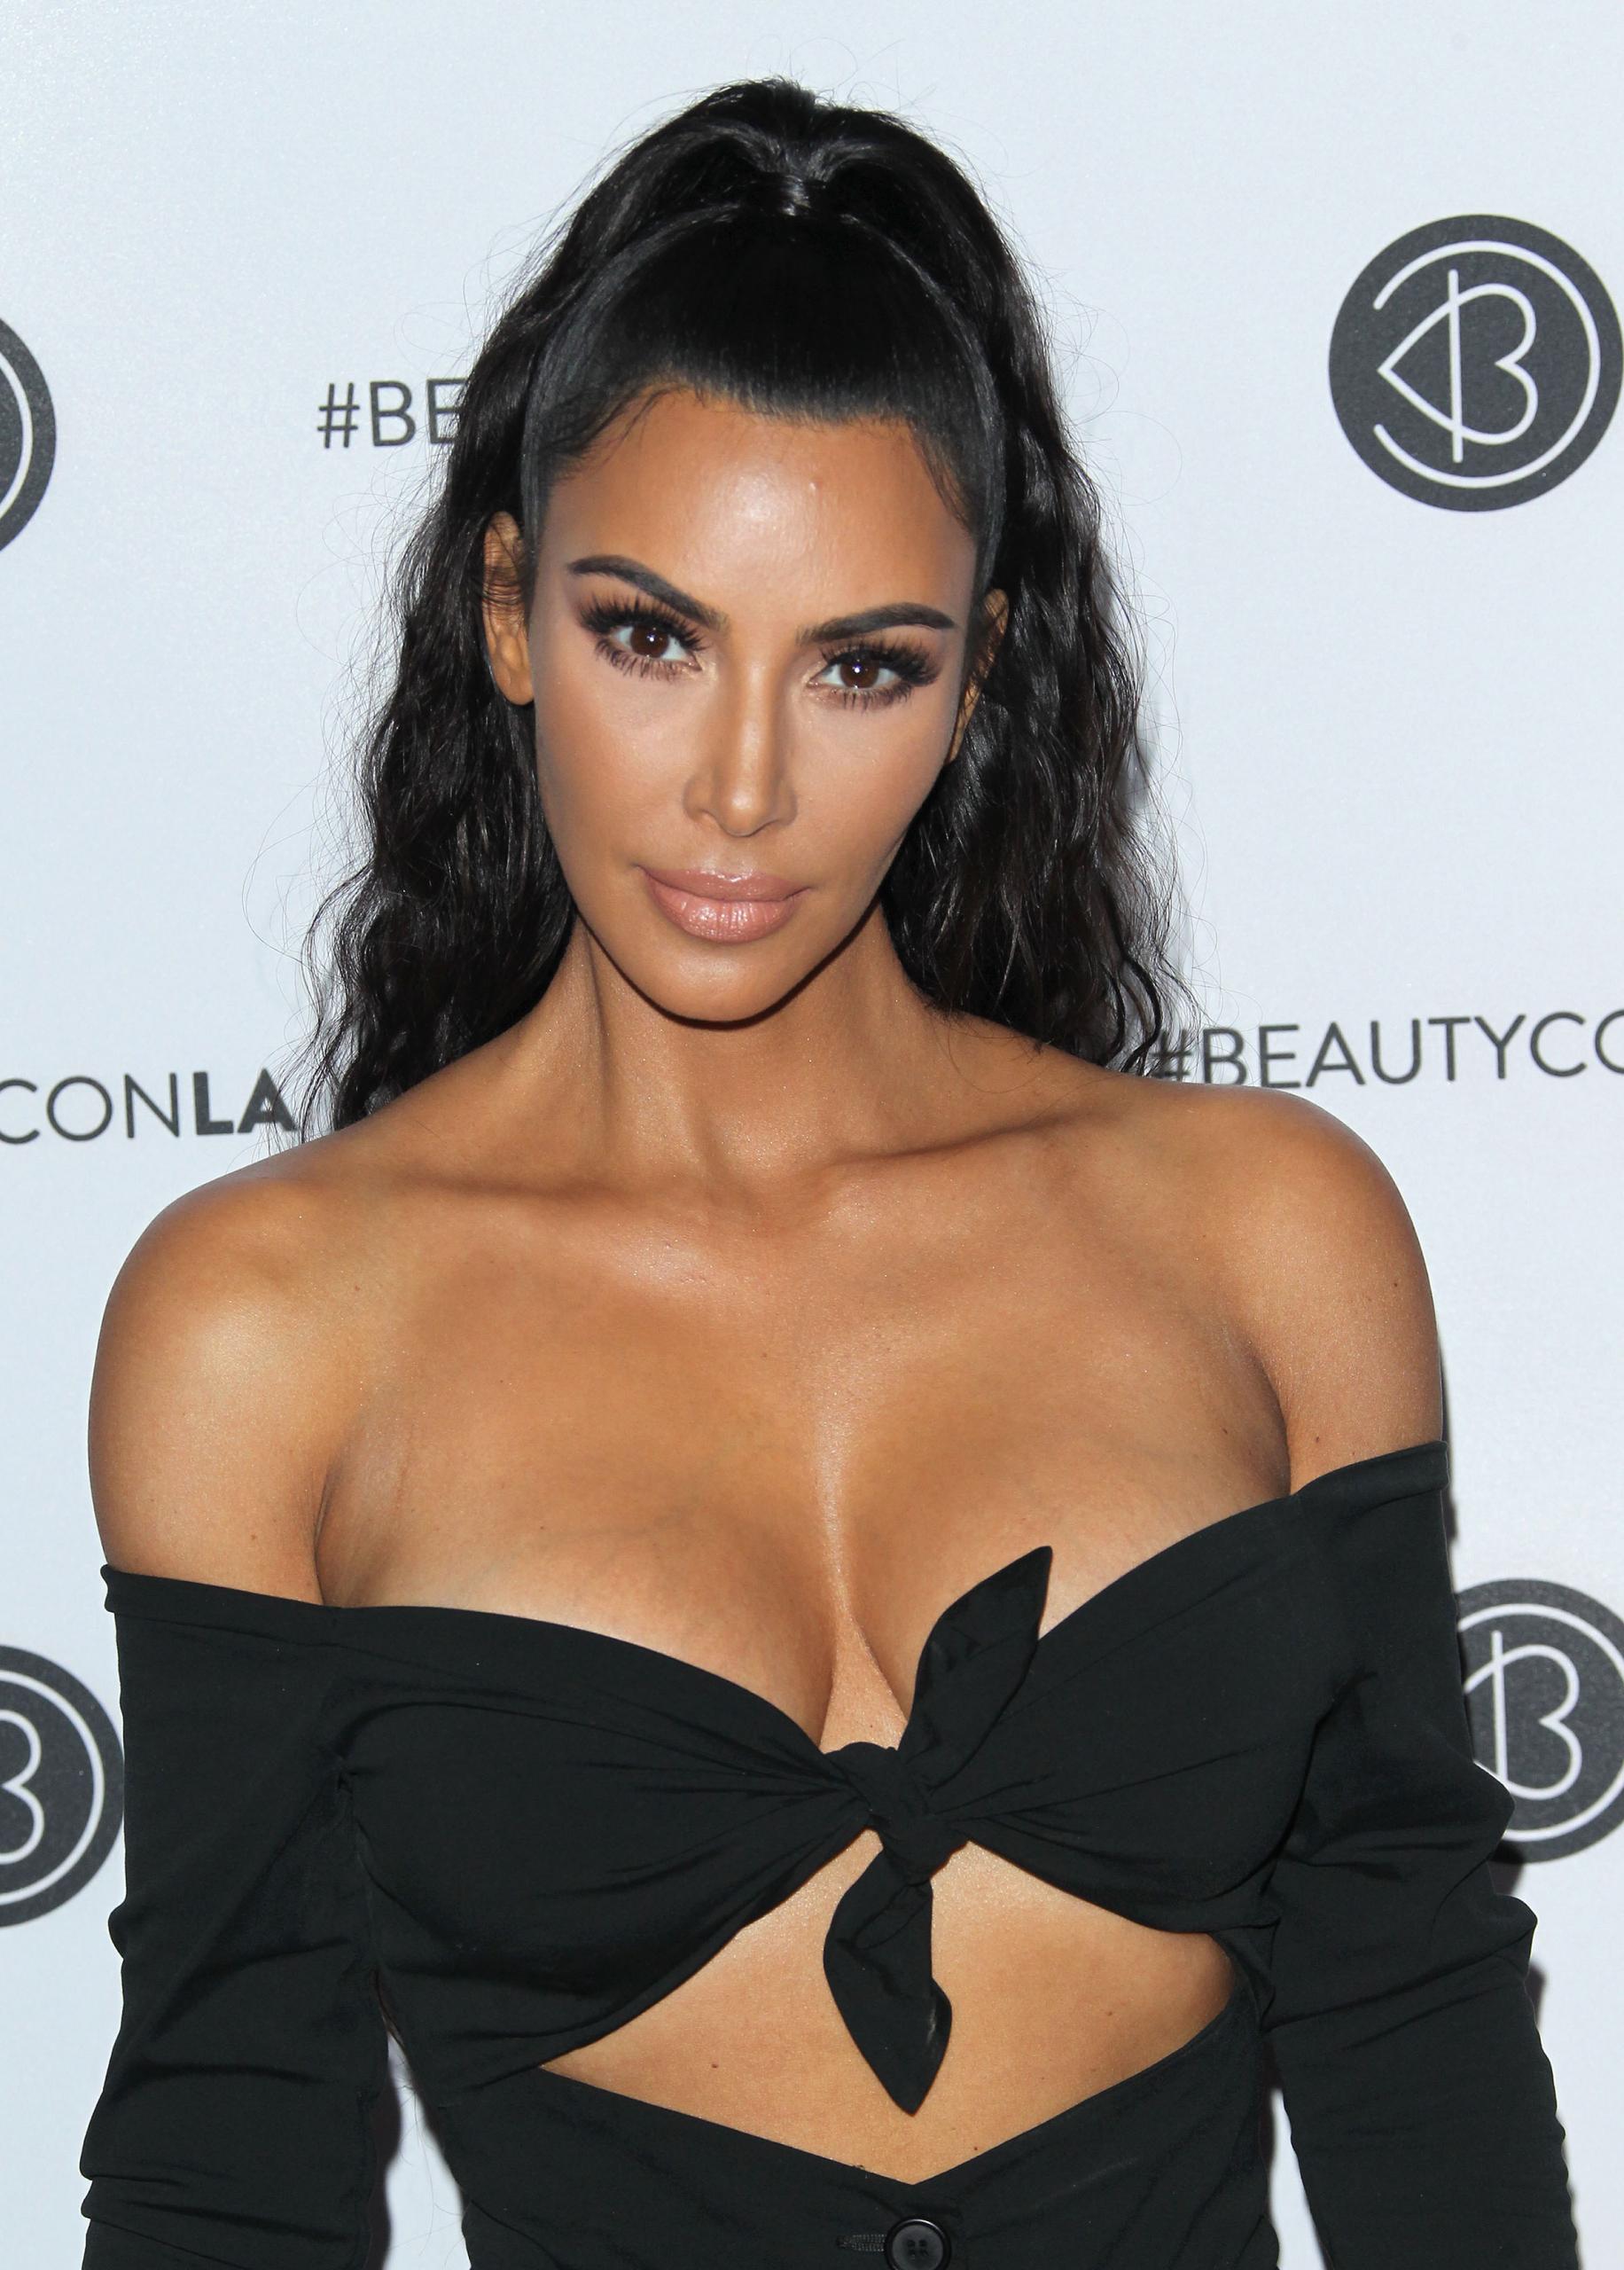 H Kim Kardashian σπουδάζει νομικά; Το επιβεβαιώνει και ο σύζυγός της Kanye West.